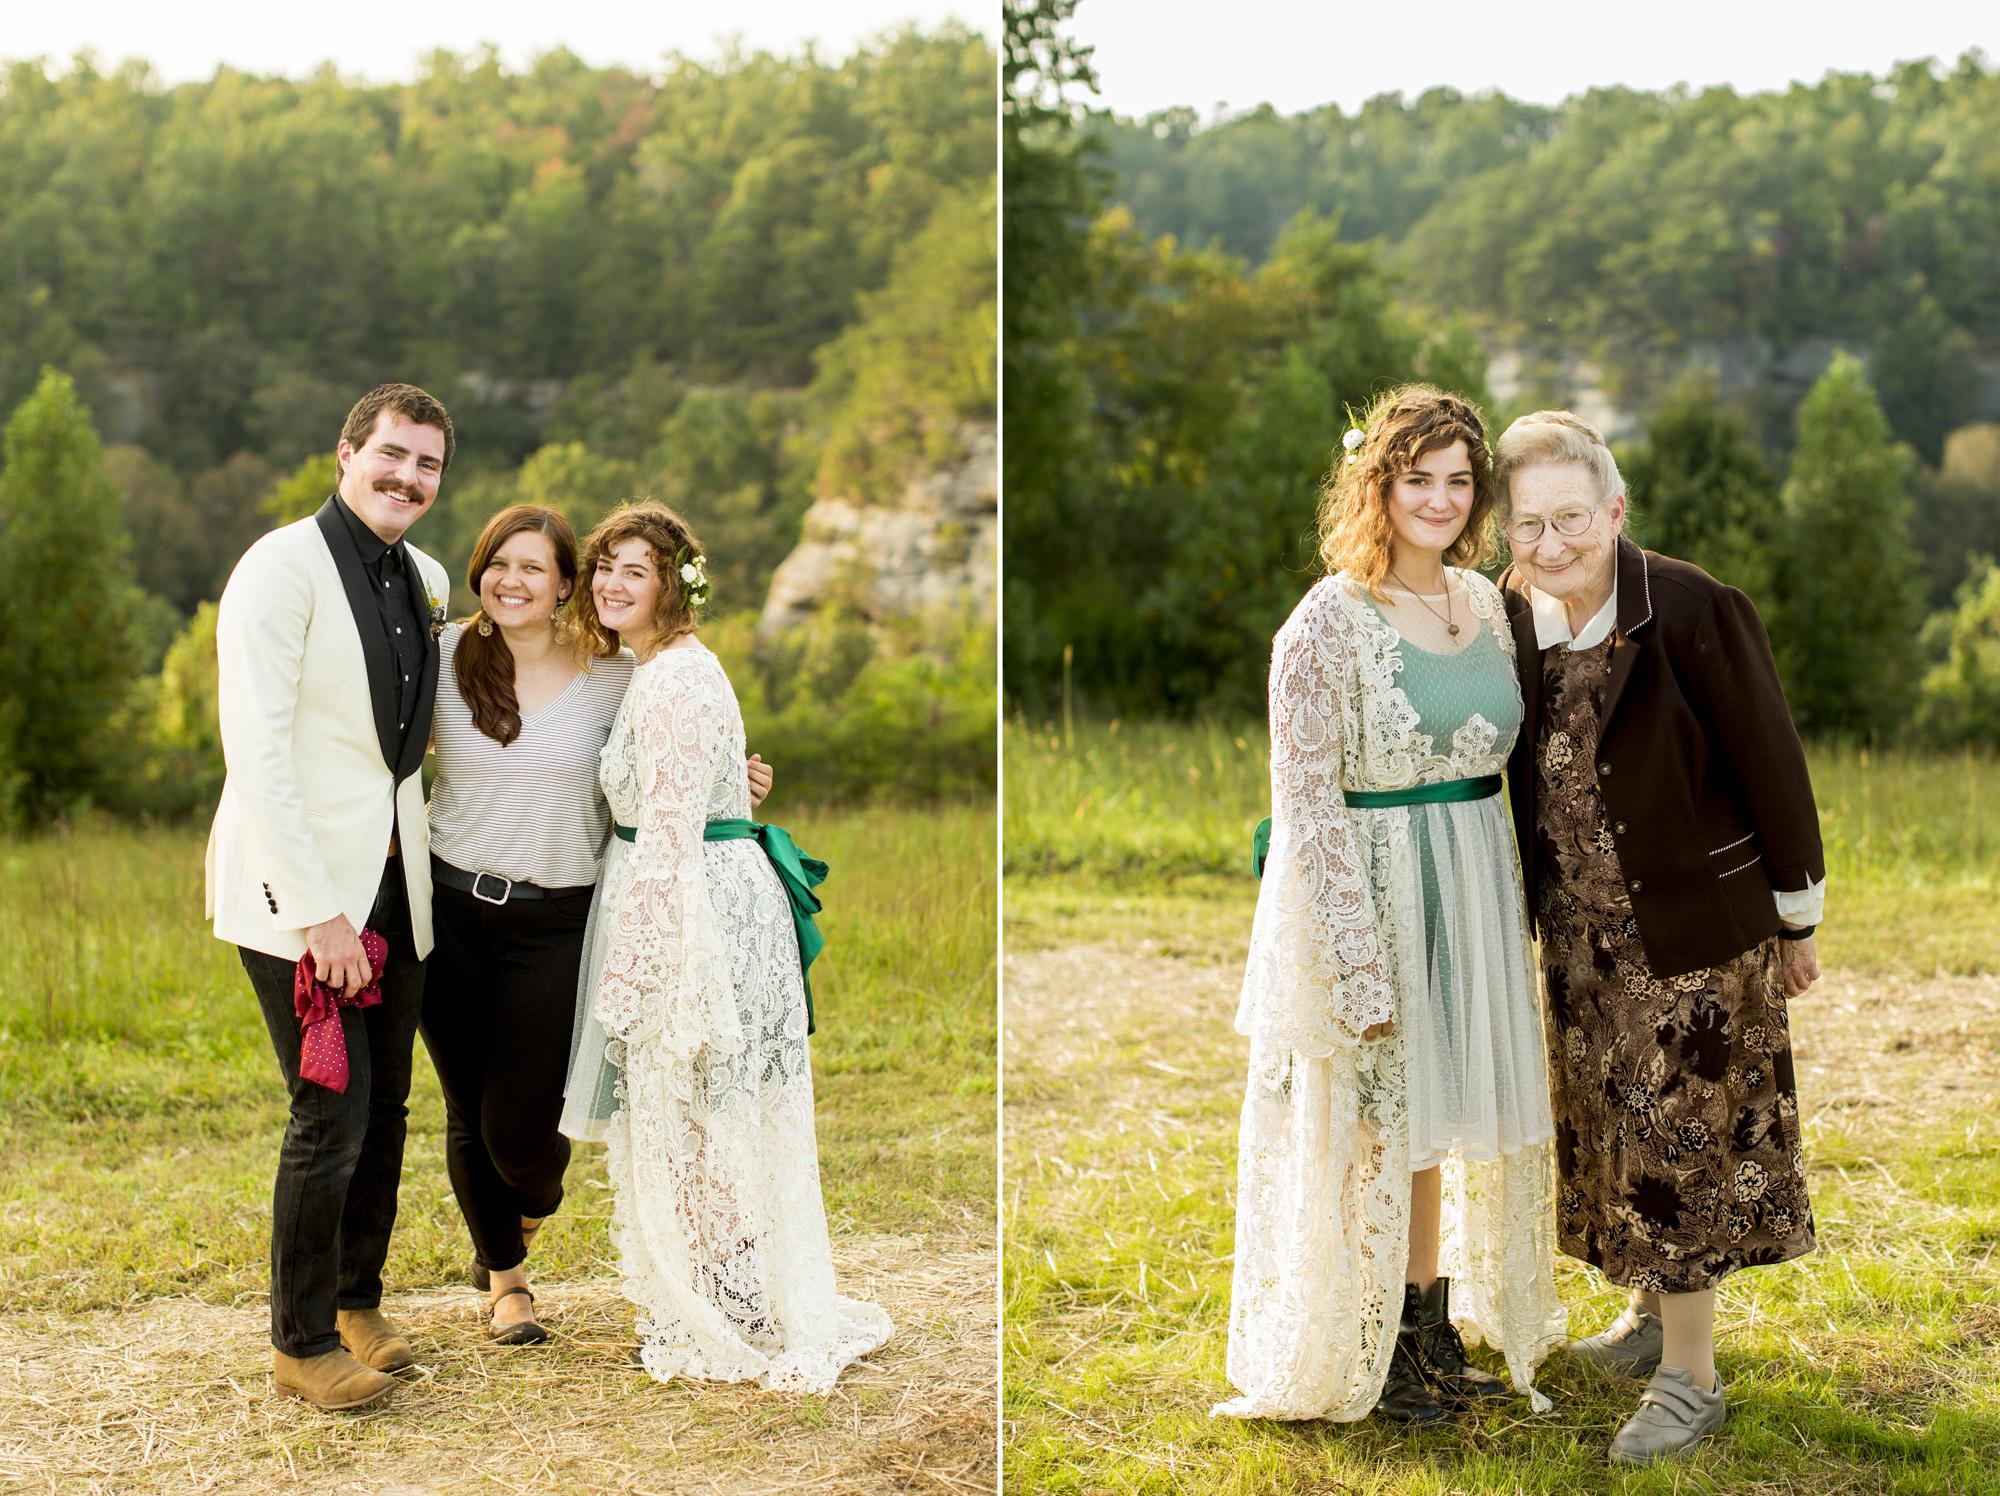 Seriously_Sabrina_Photography_Red_River_Gorge_Kentucky_Wedding_ShawnDana147.jpg